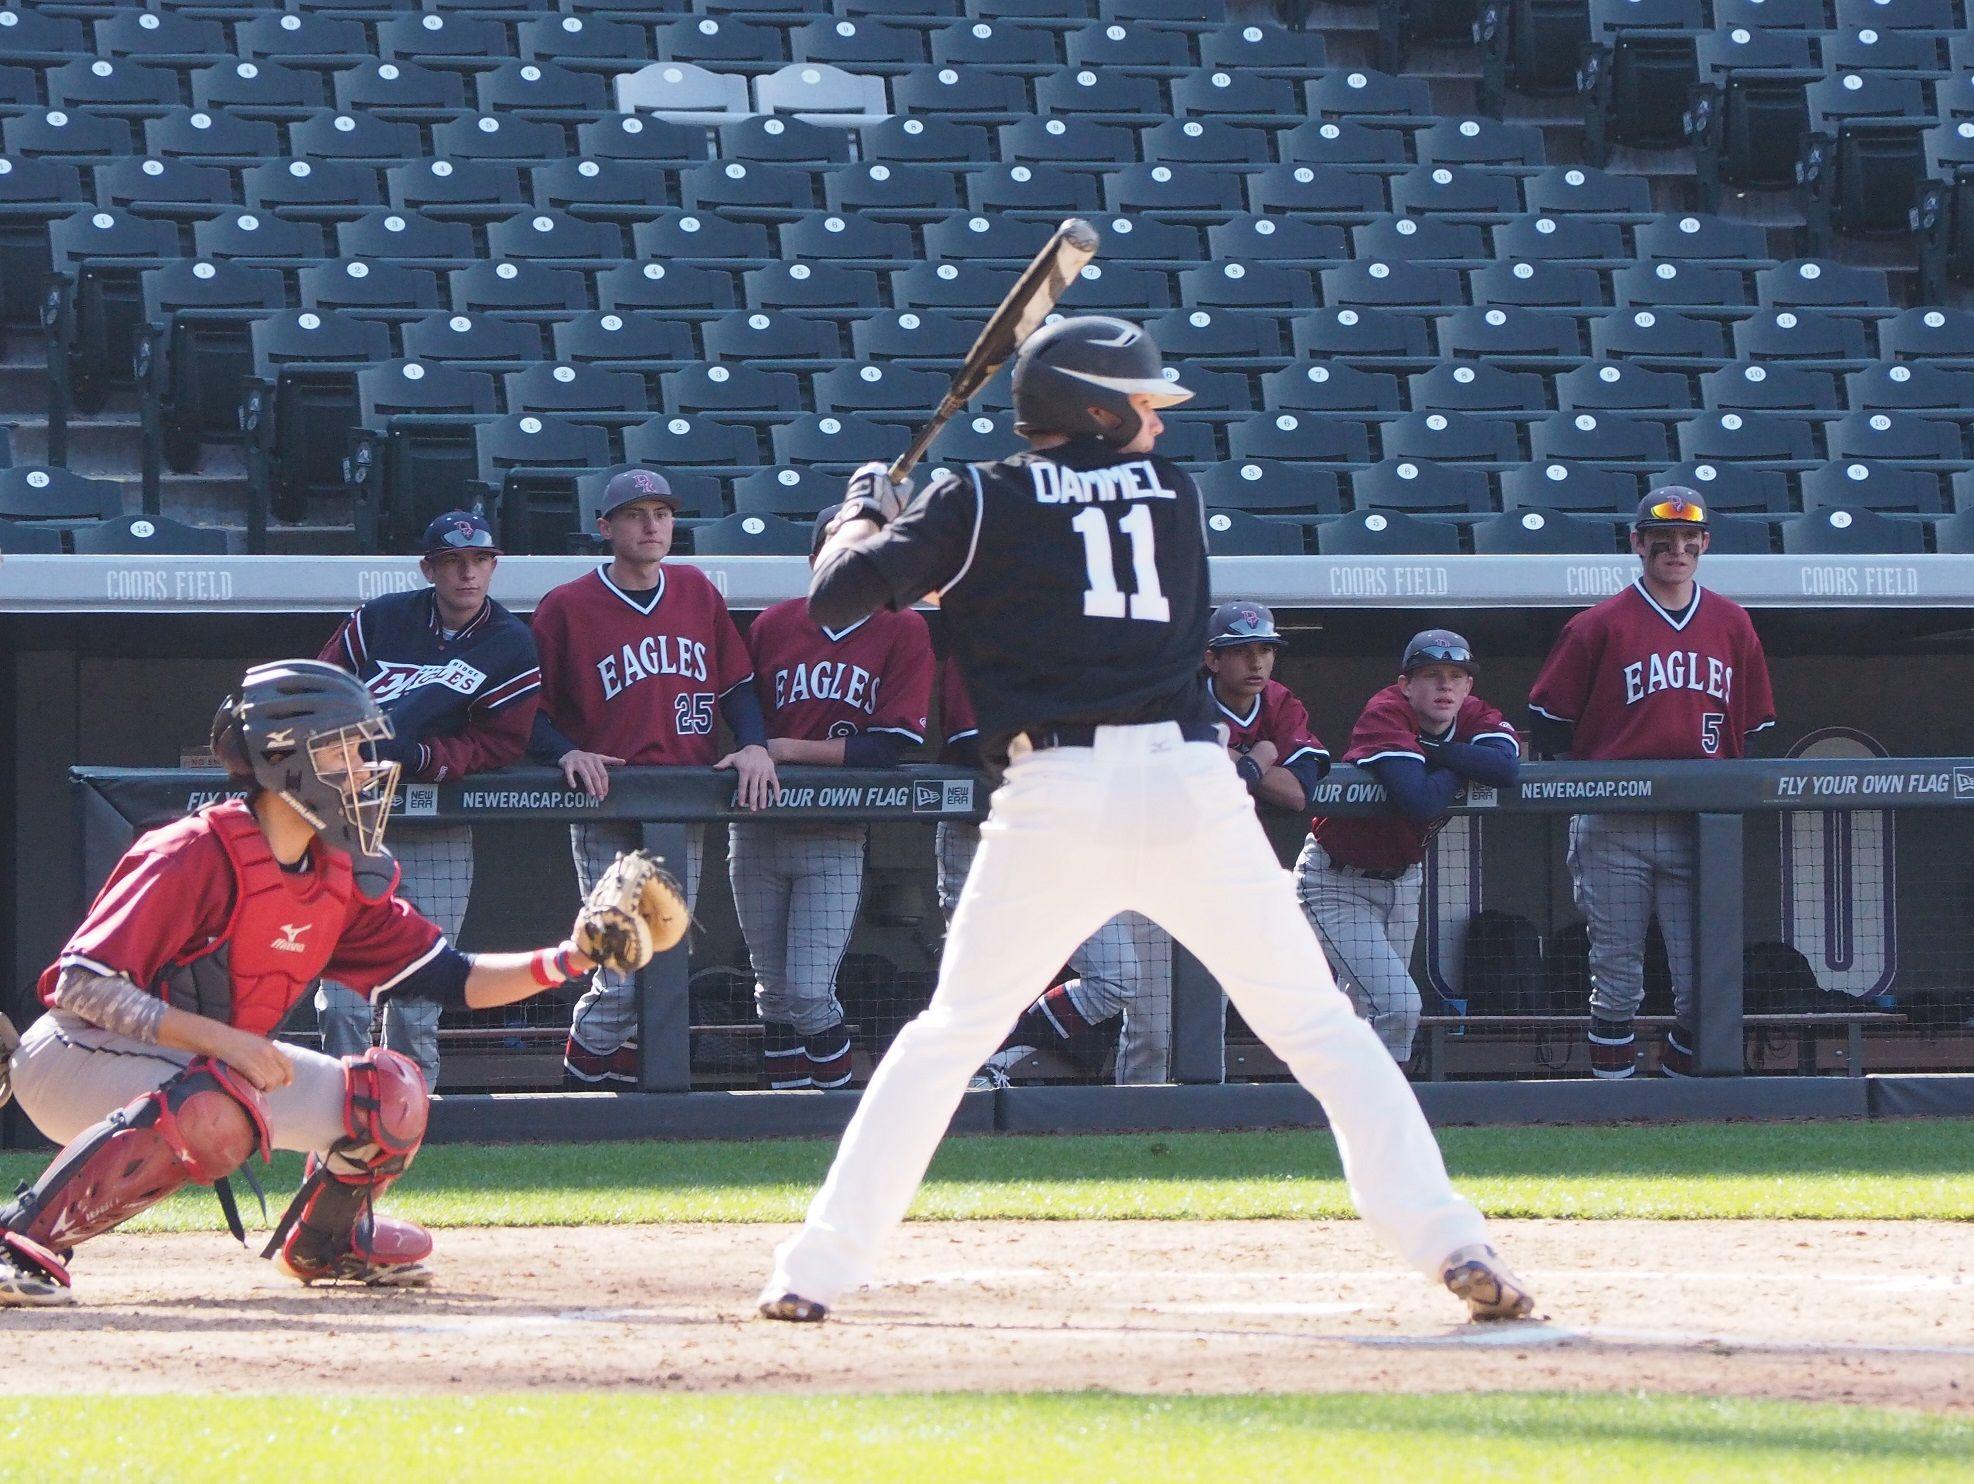 Highlands Ranchs Dammel Selected For Usa Baseball Camp Usa Today